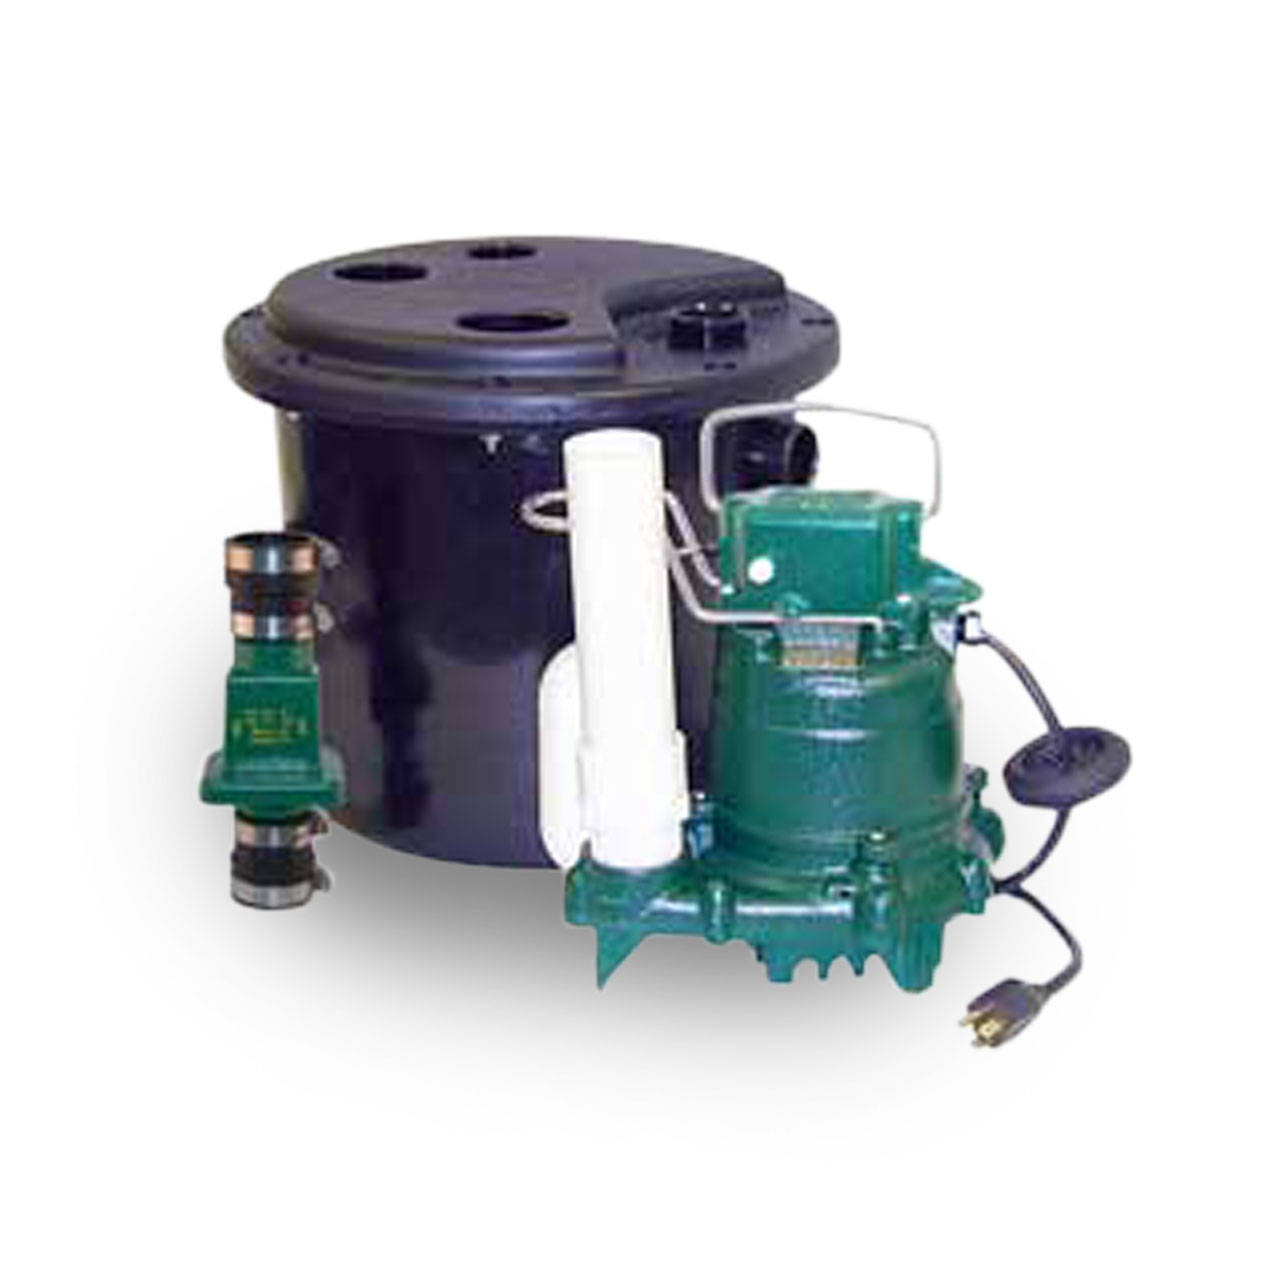 Zoeller - Zoeller 120-0001 Model 120 Preassembled M59 Drain Pump System  with Polypropylene Basin & Lid #ZLR120-0001